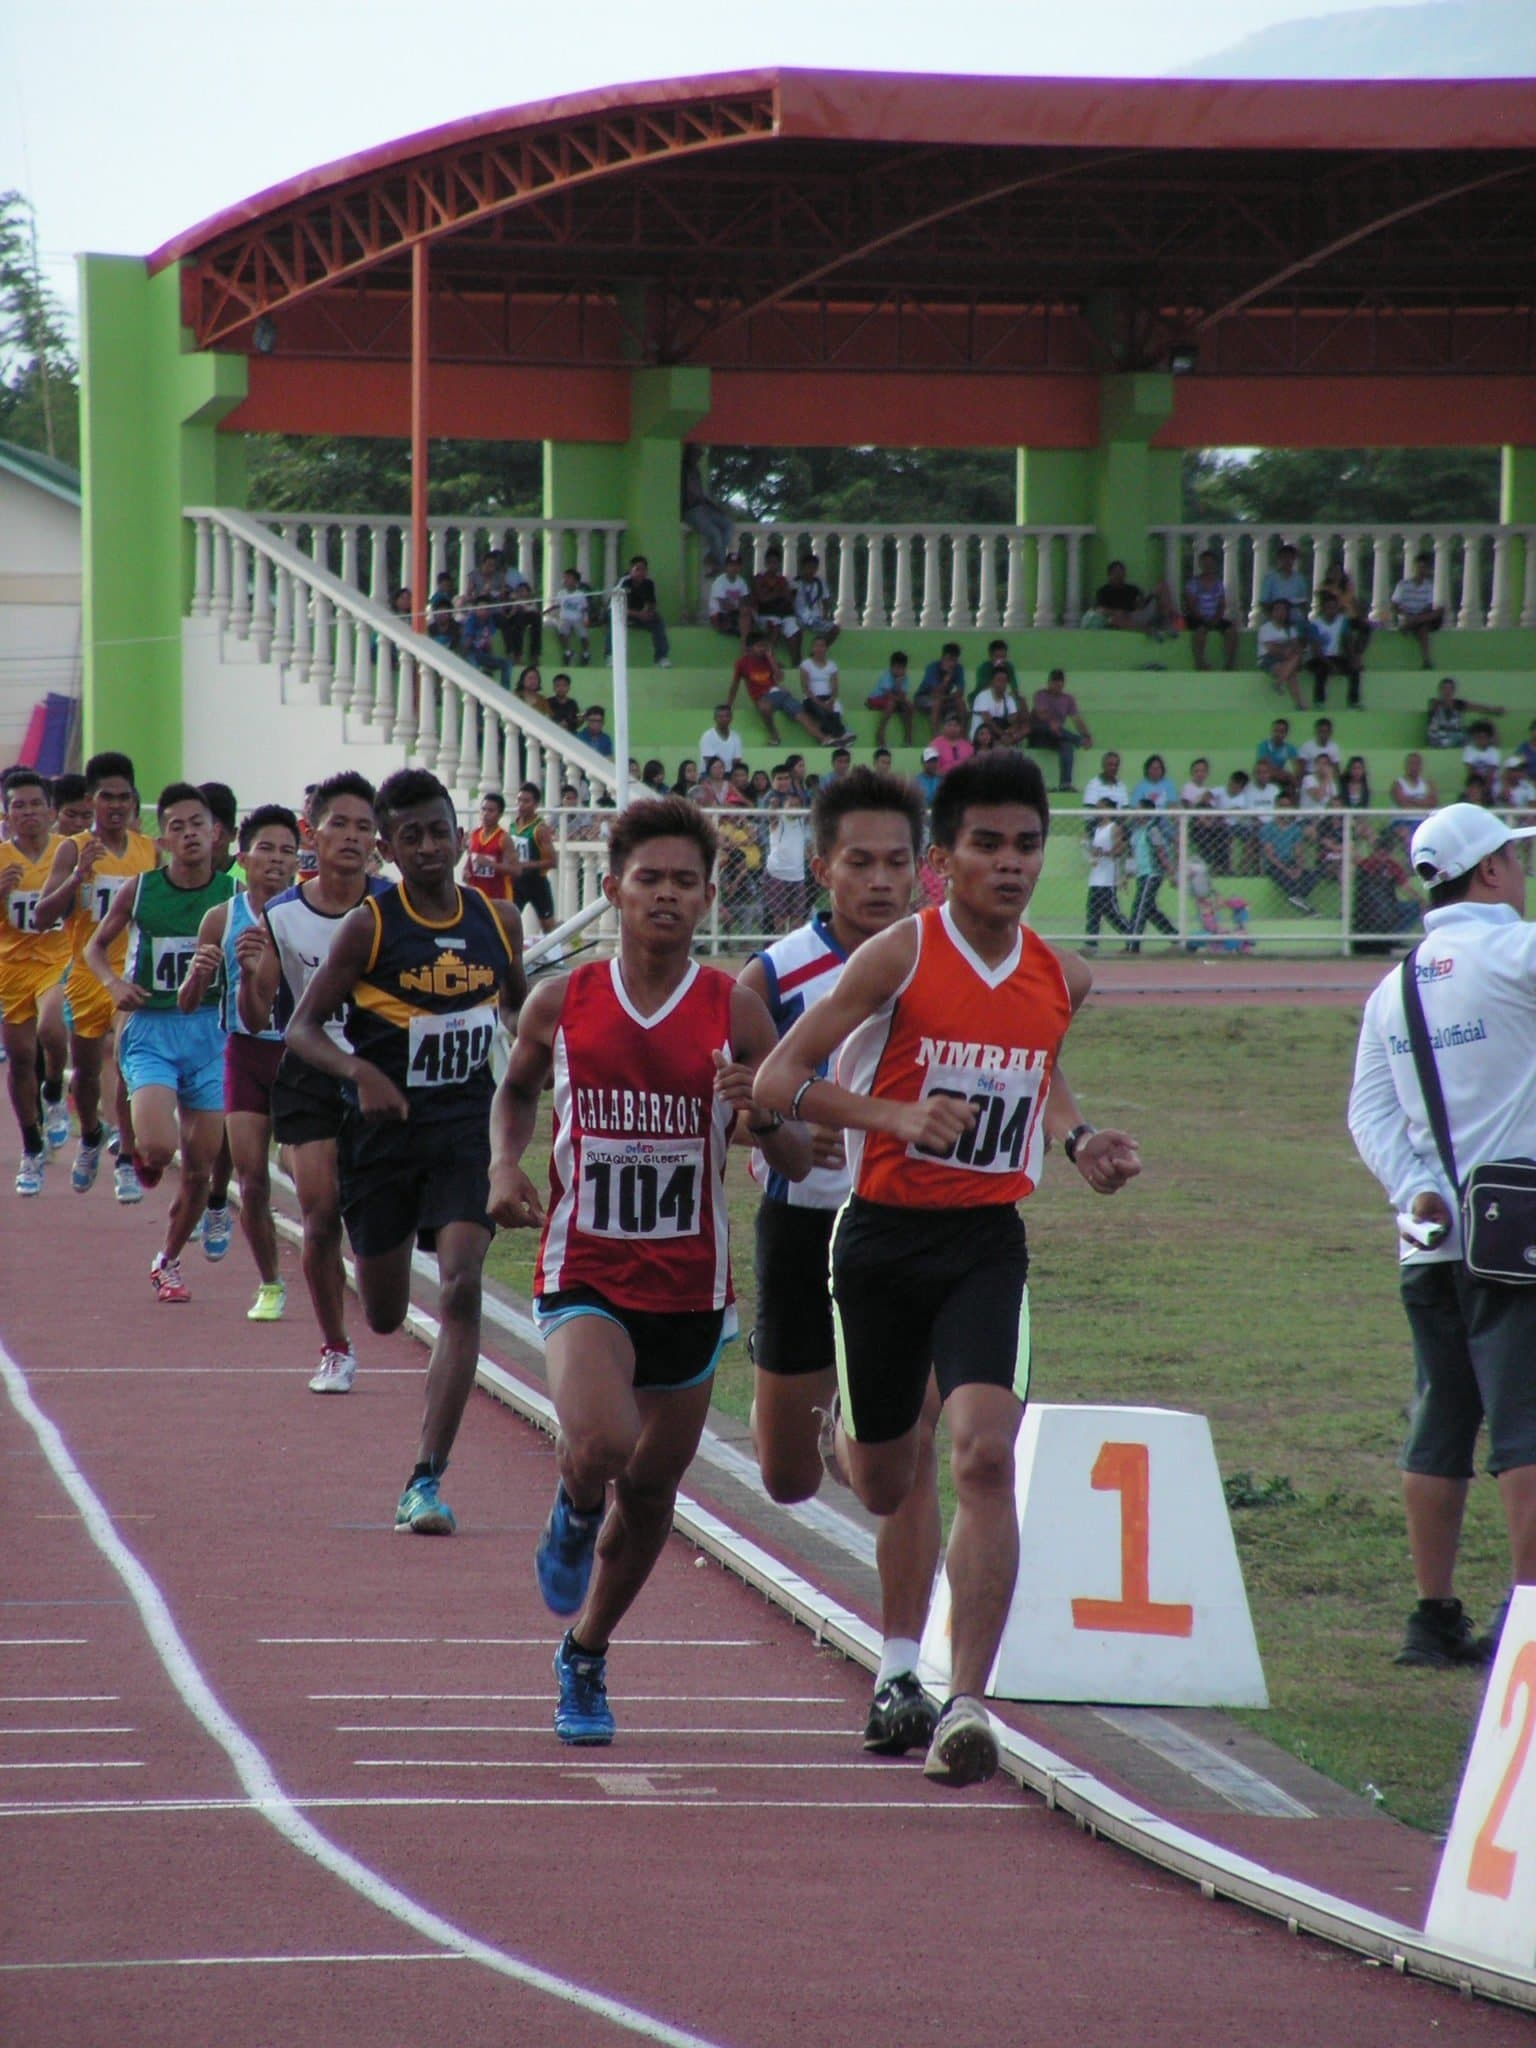 Capangpangan (304) during 1500m Run